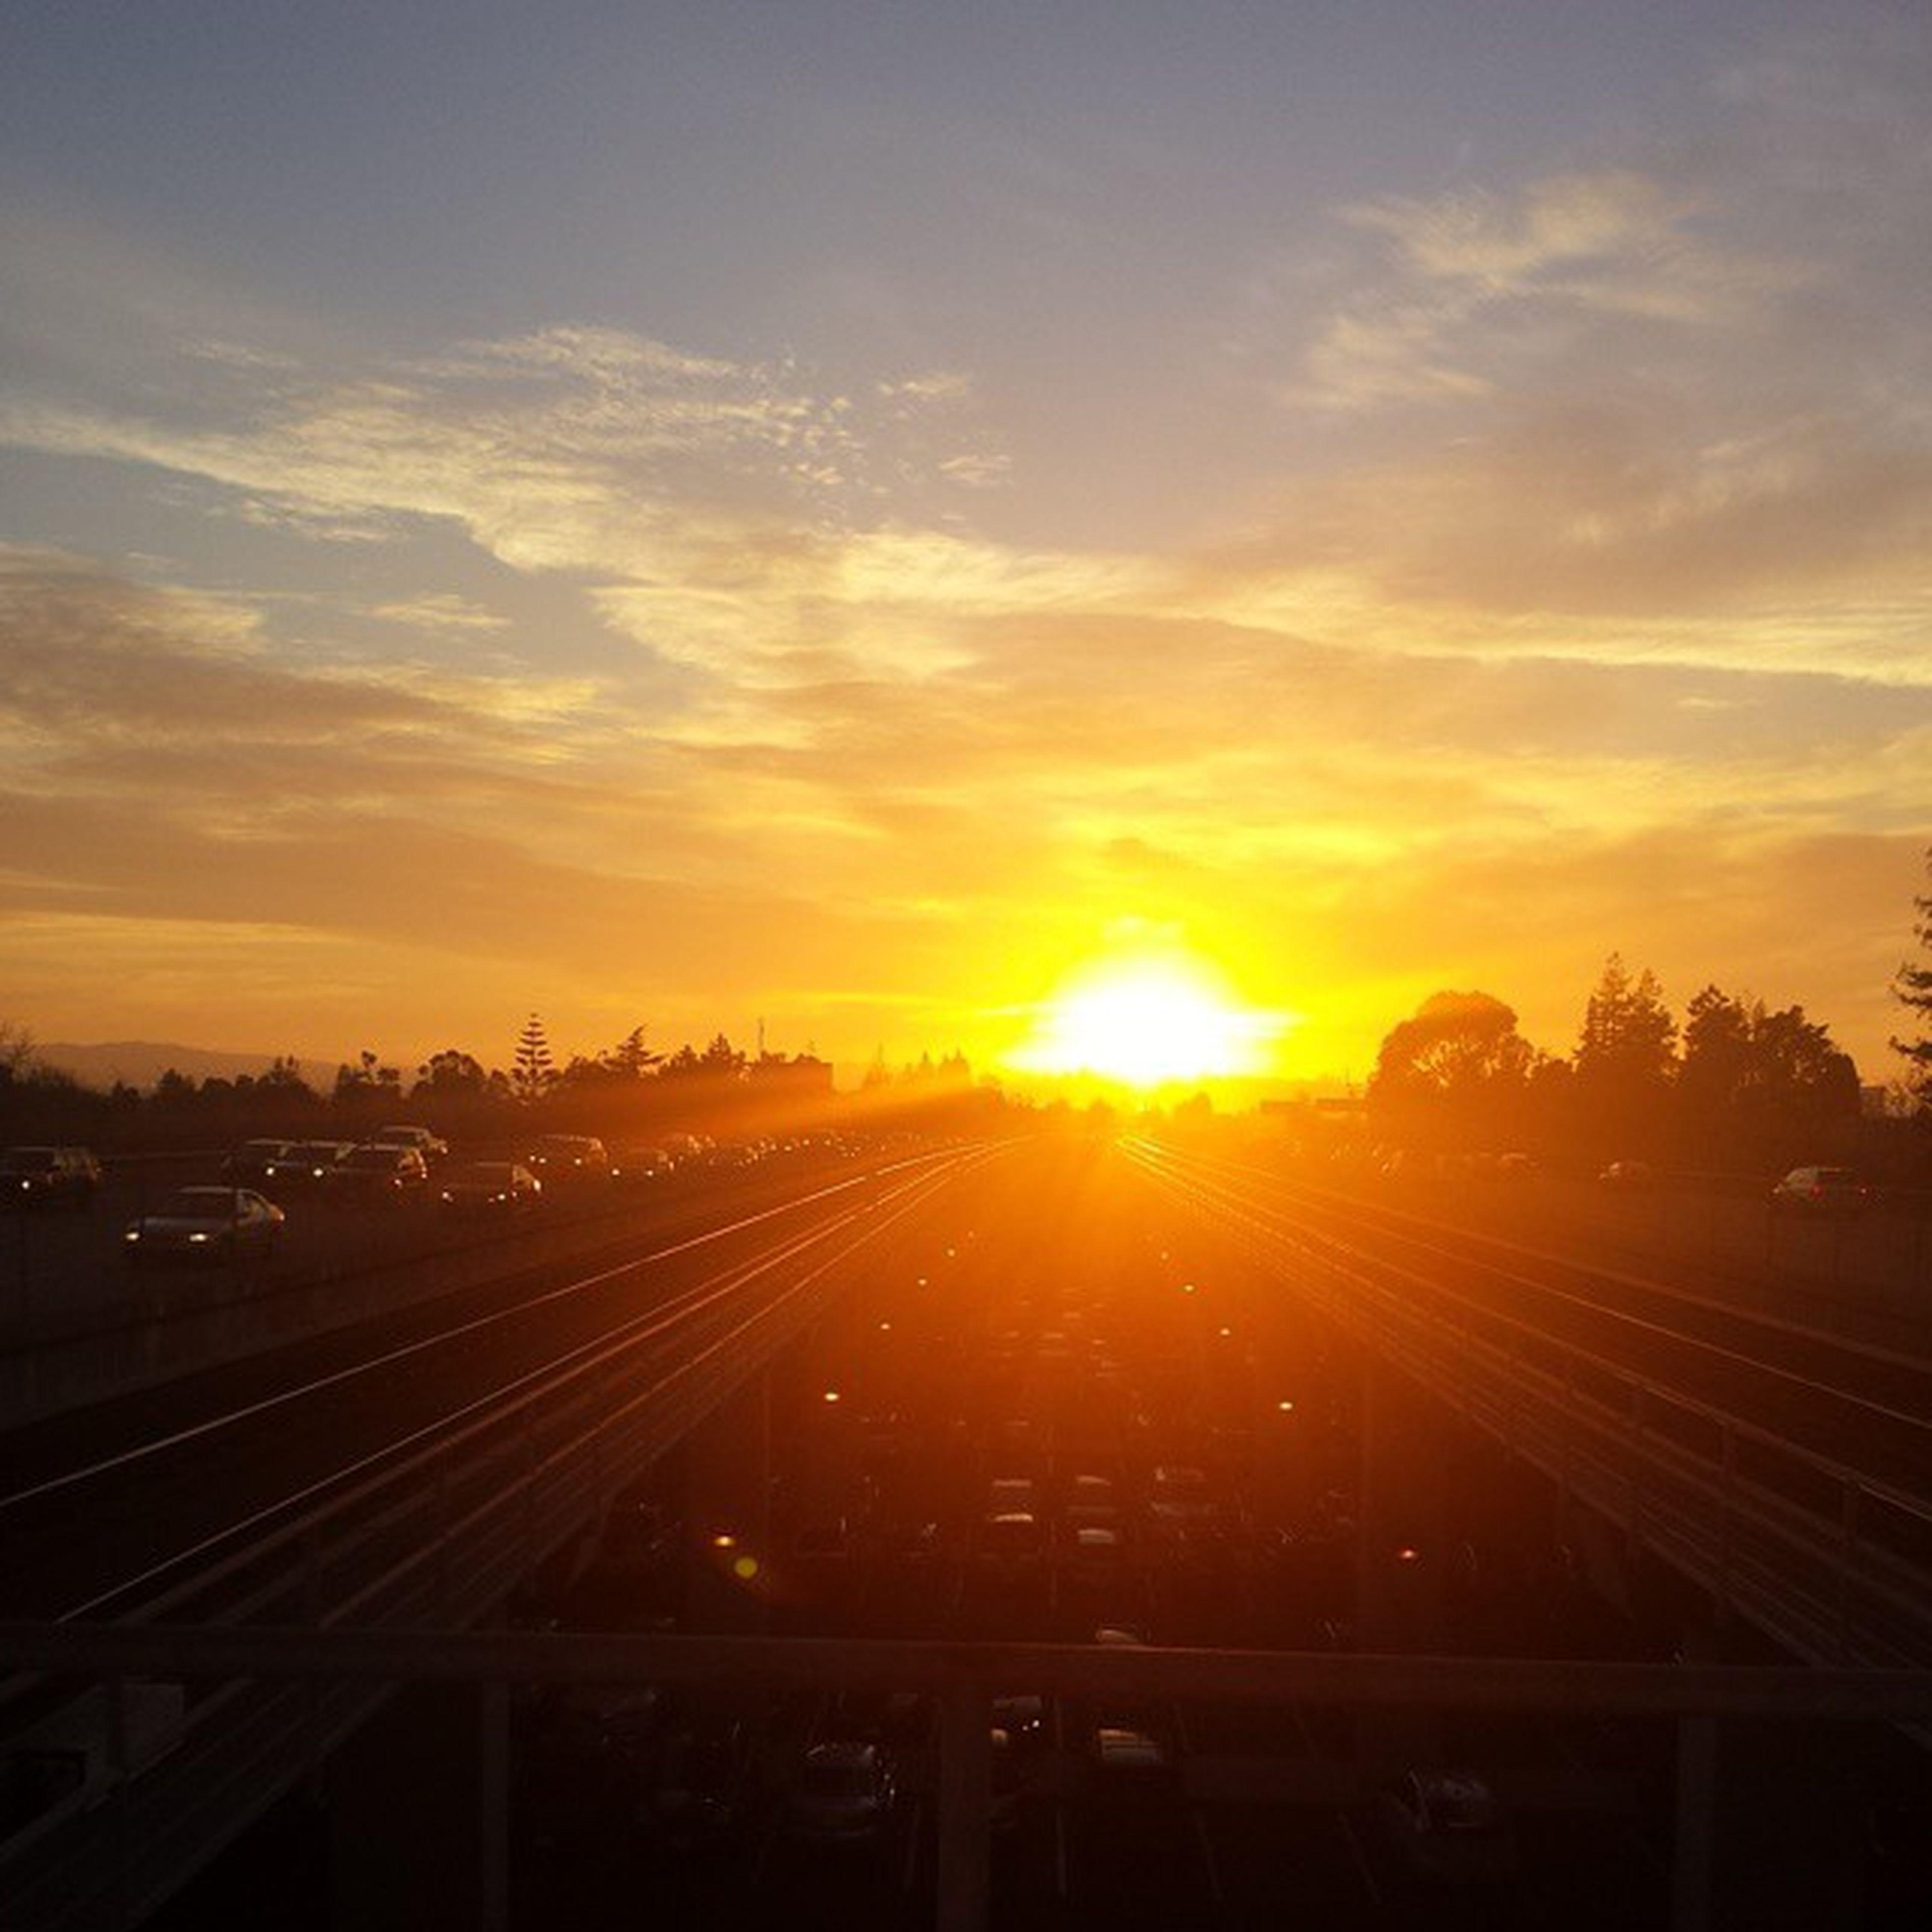 transportation, sunset, sky, railroad track, the way forward, road, sun, diminishing perspective, cloud - sky, vanishing point, lens flare, sunbeam, orange color, mode of transport, sunlight, rail transportation, car, land vehicle, on the move, silhouette